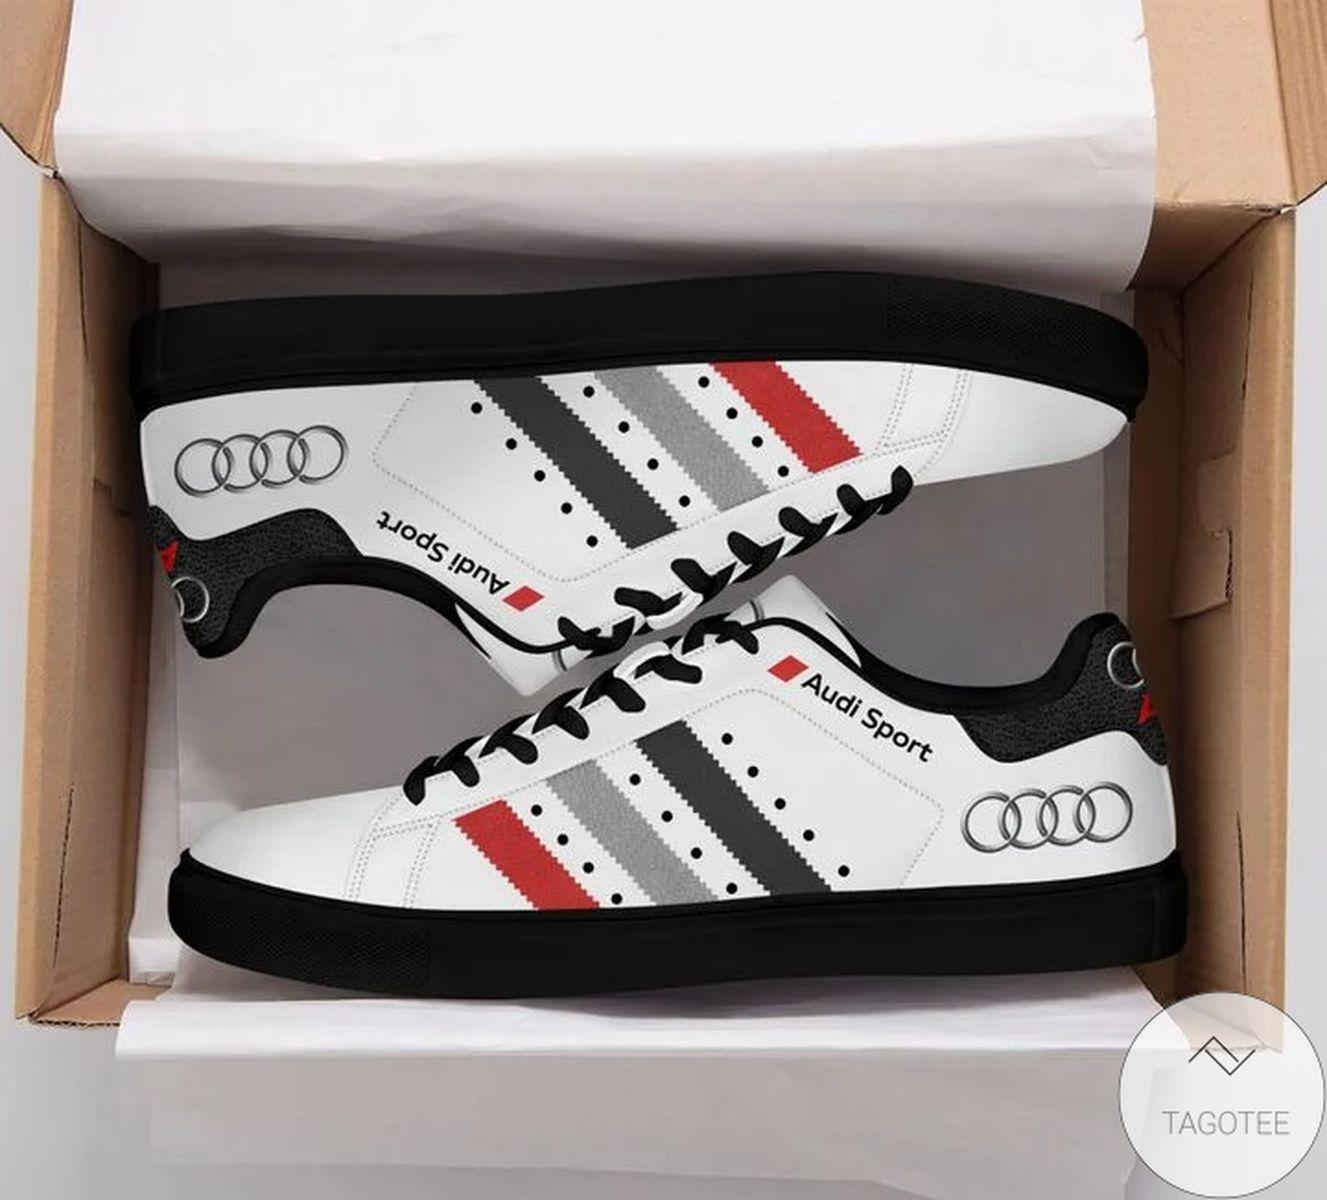 Audi Sports Stan Smith Shoes